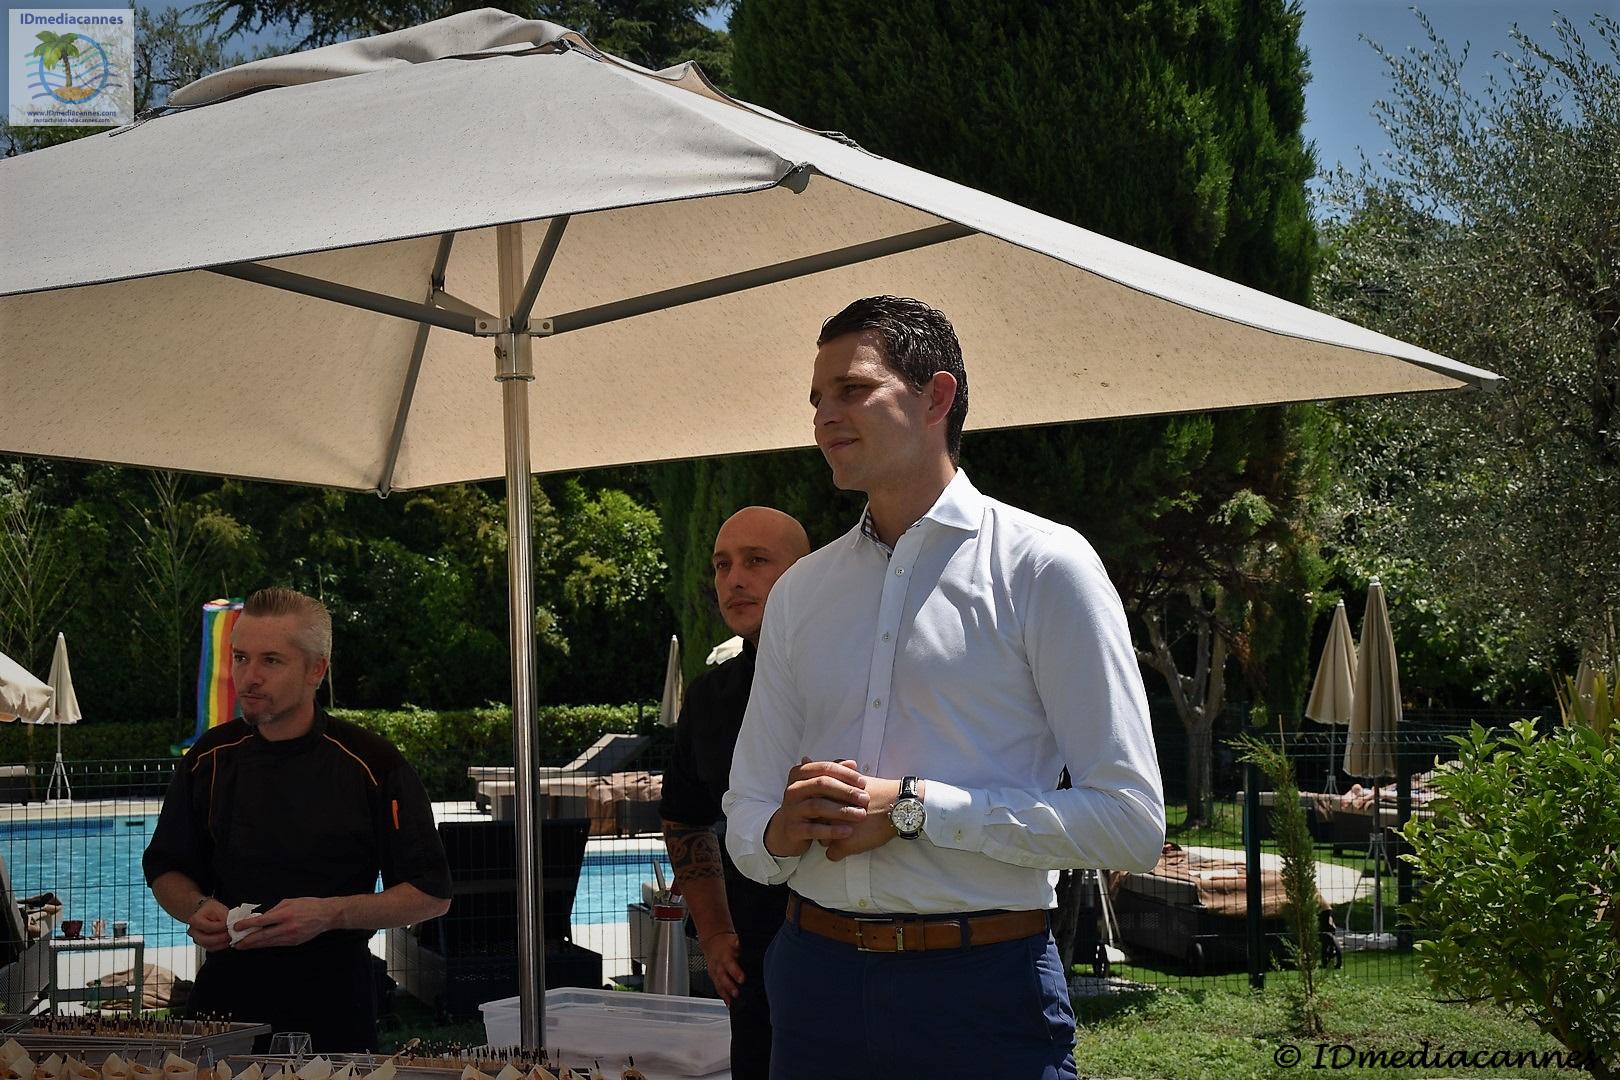 Basile arnaud le jardin idmediacannes for Le jardin mougins restaurant